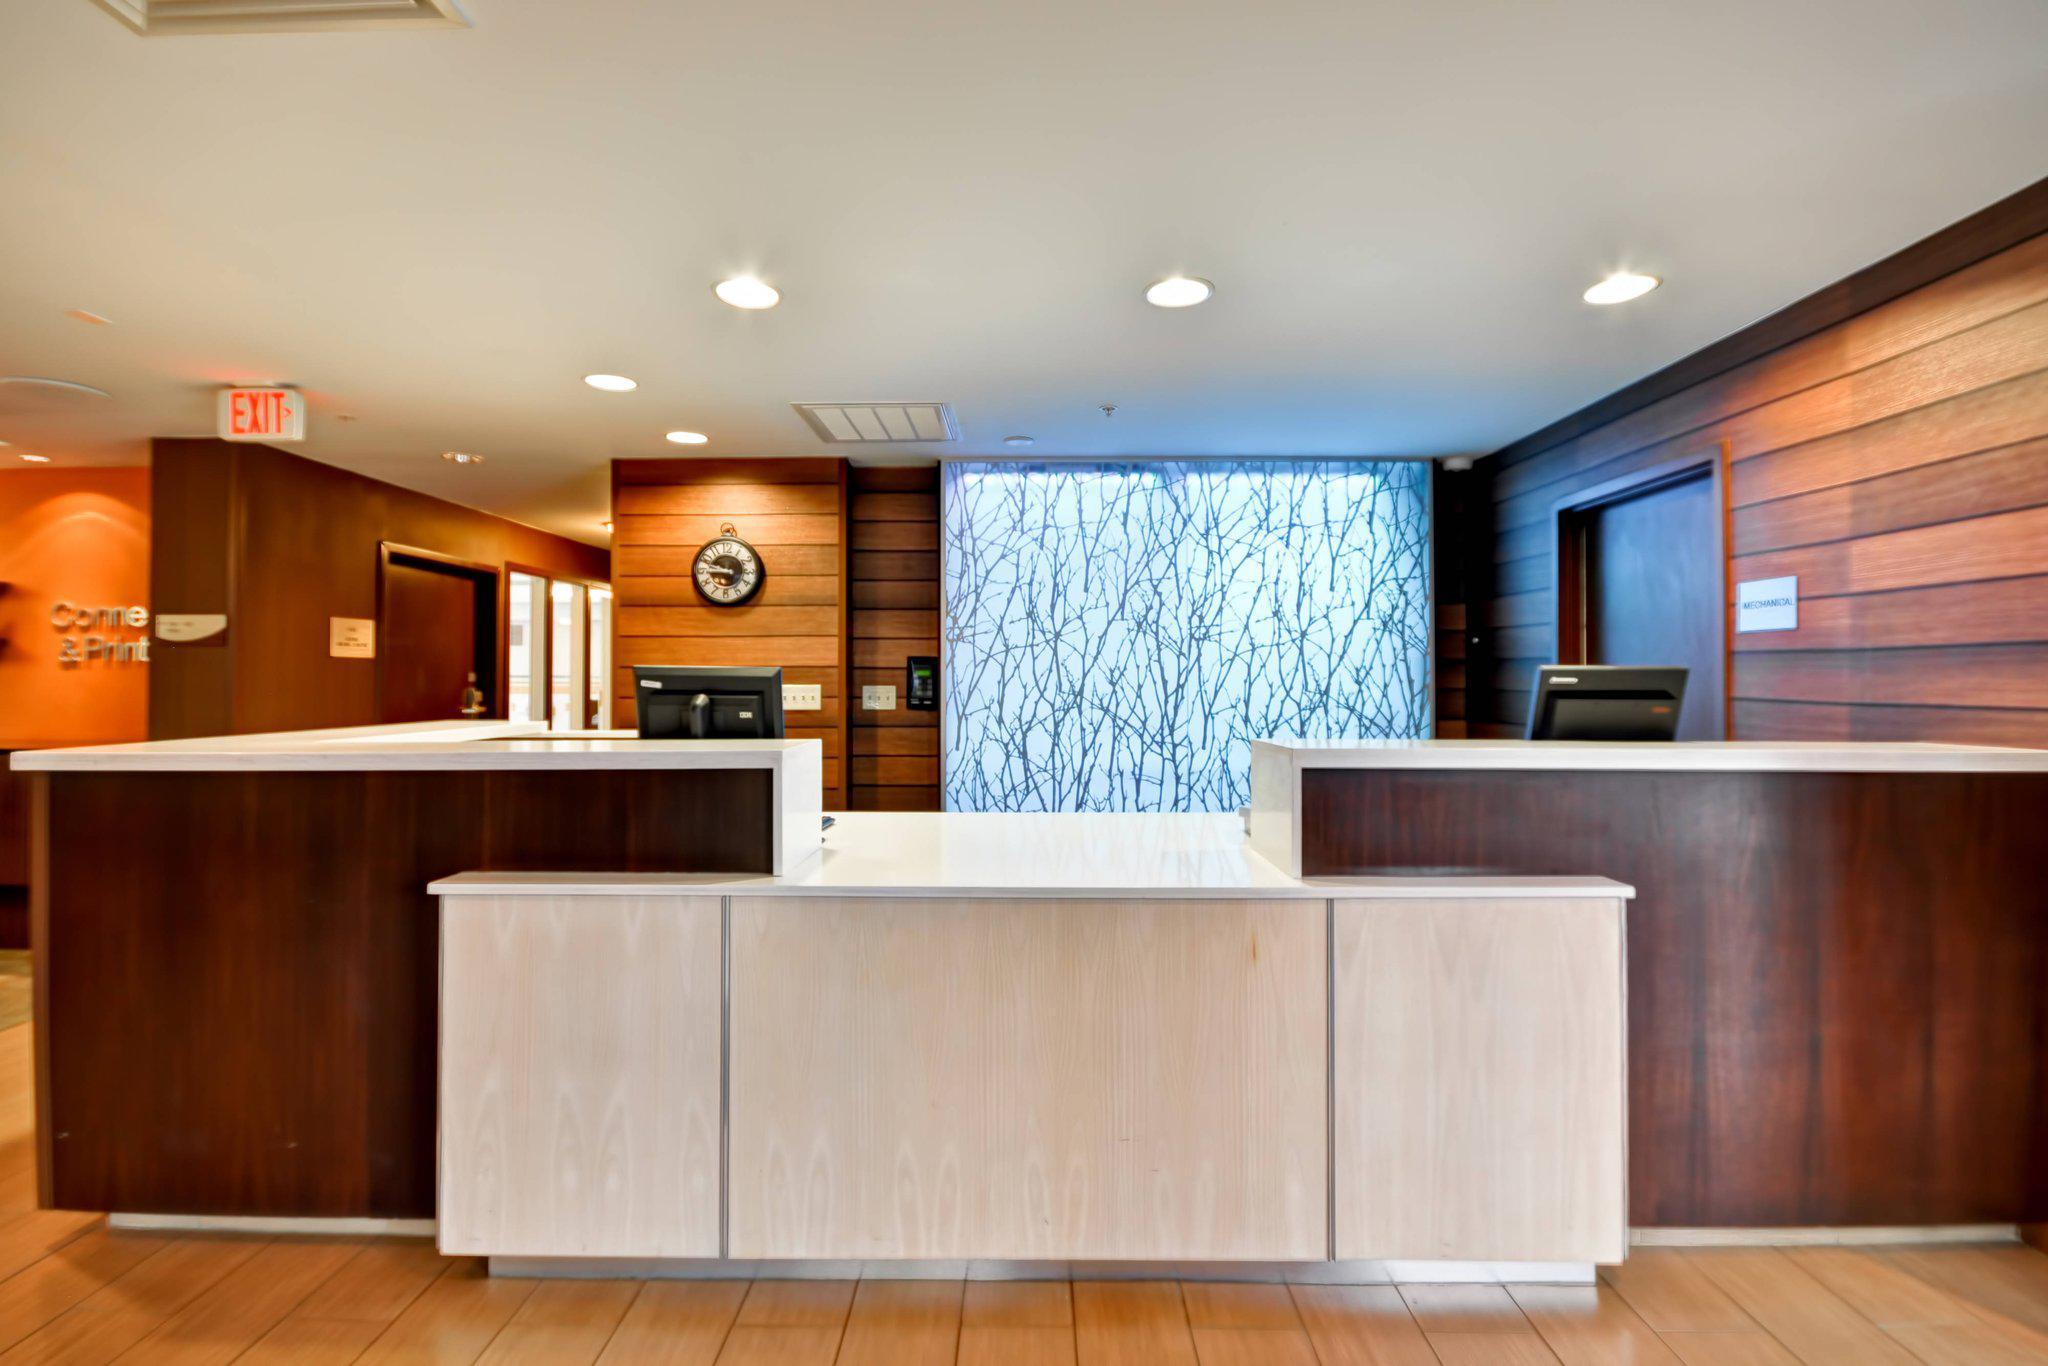 Fairfield Inn & Suites by Marriott Dallas Medical/Market Center